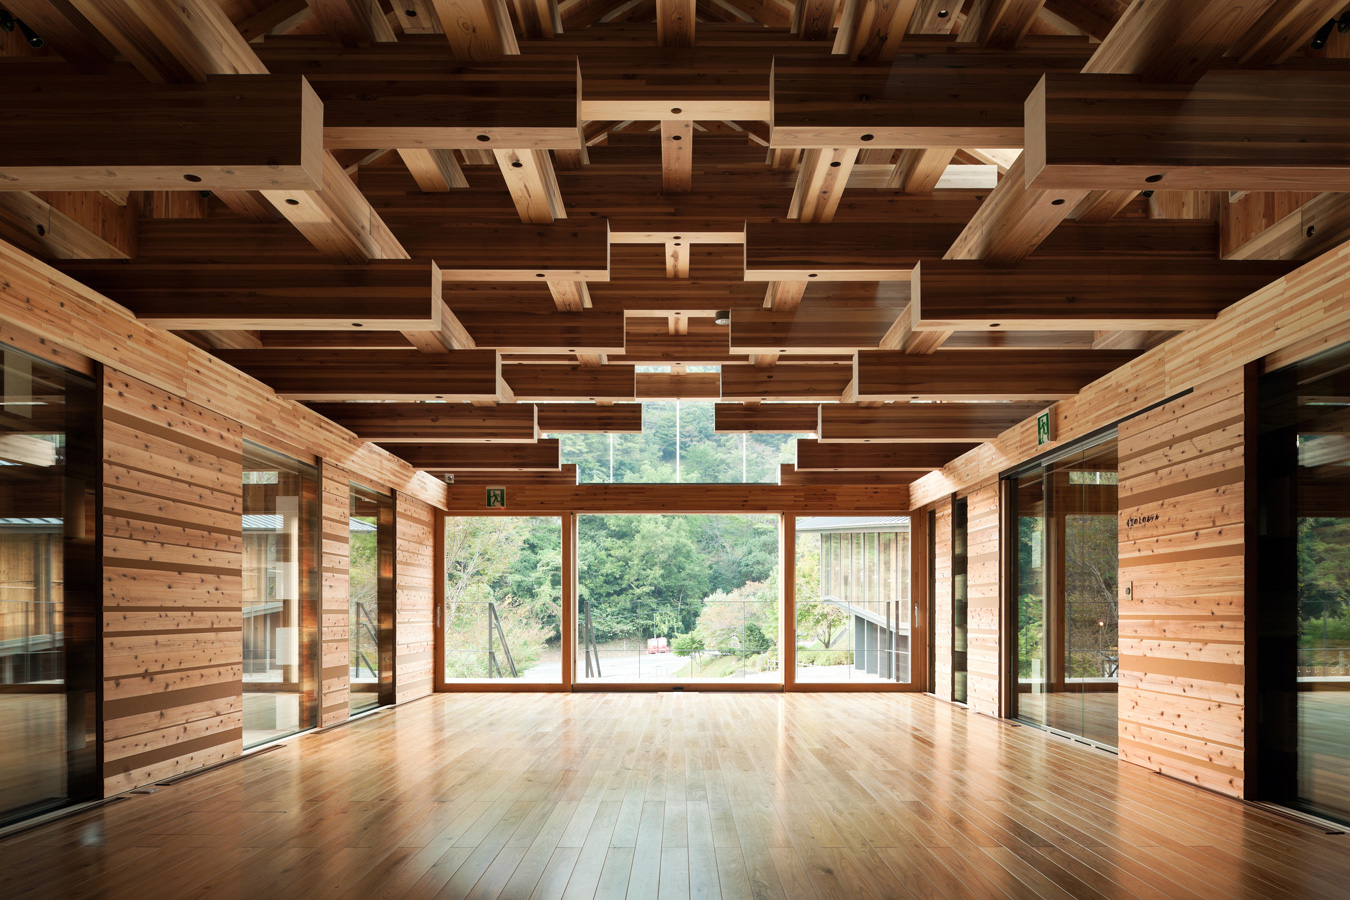 Yusuhara wooden bridge museum kengo kuma and associates for Wood architectural columns